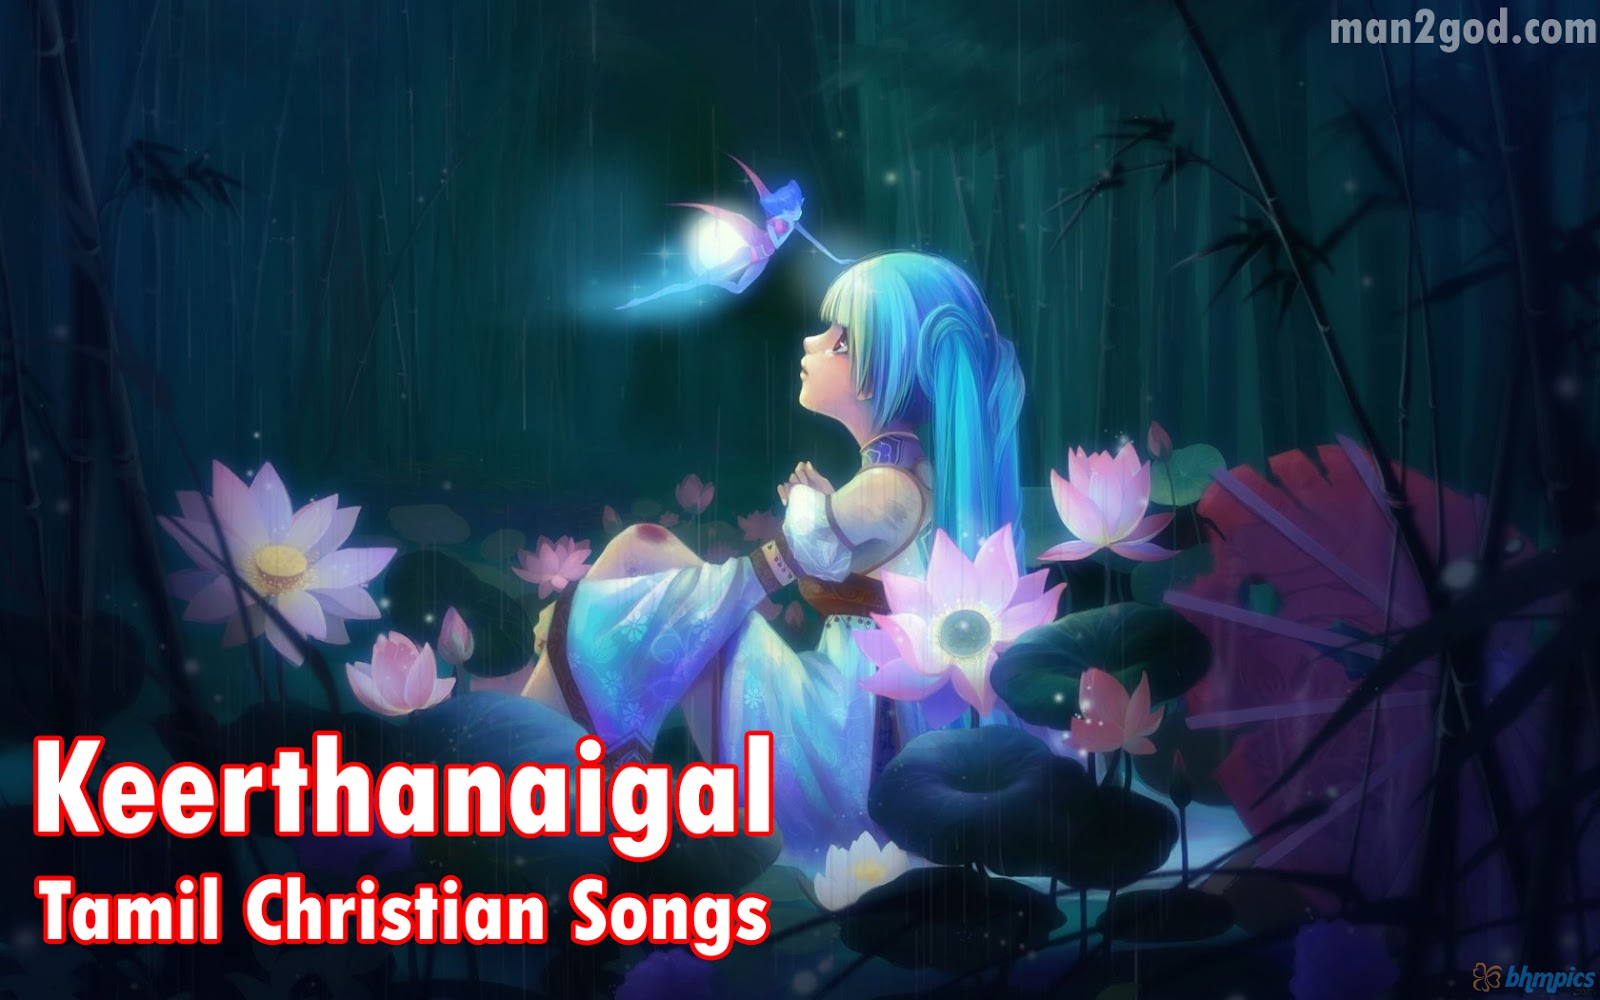 Keerthanaigal Tamil Christian Songs Free Download